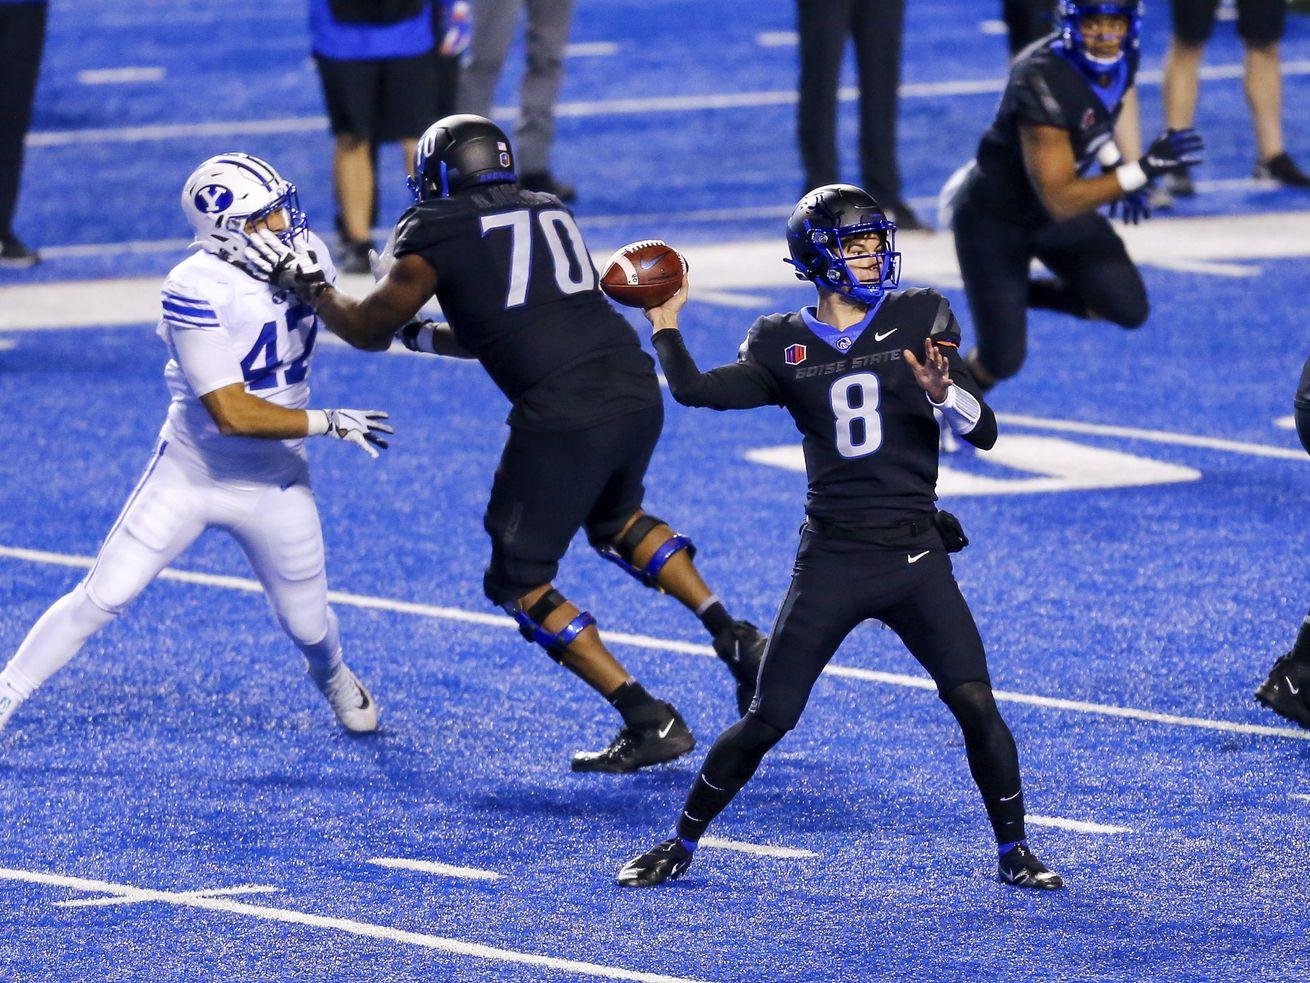 Boise State quarterback Cade Fennegan (8) throws the ball against the BYU defense.